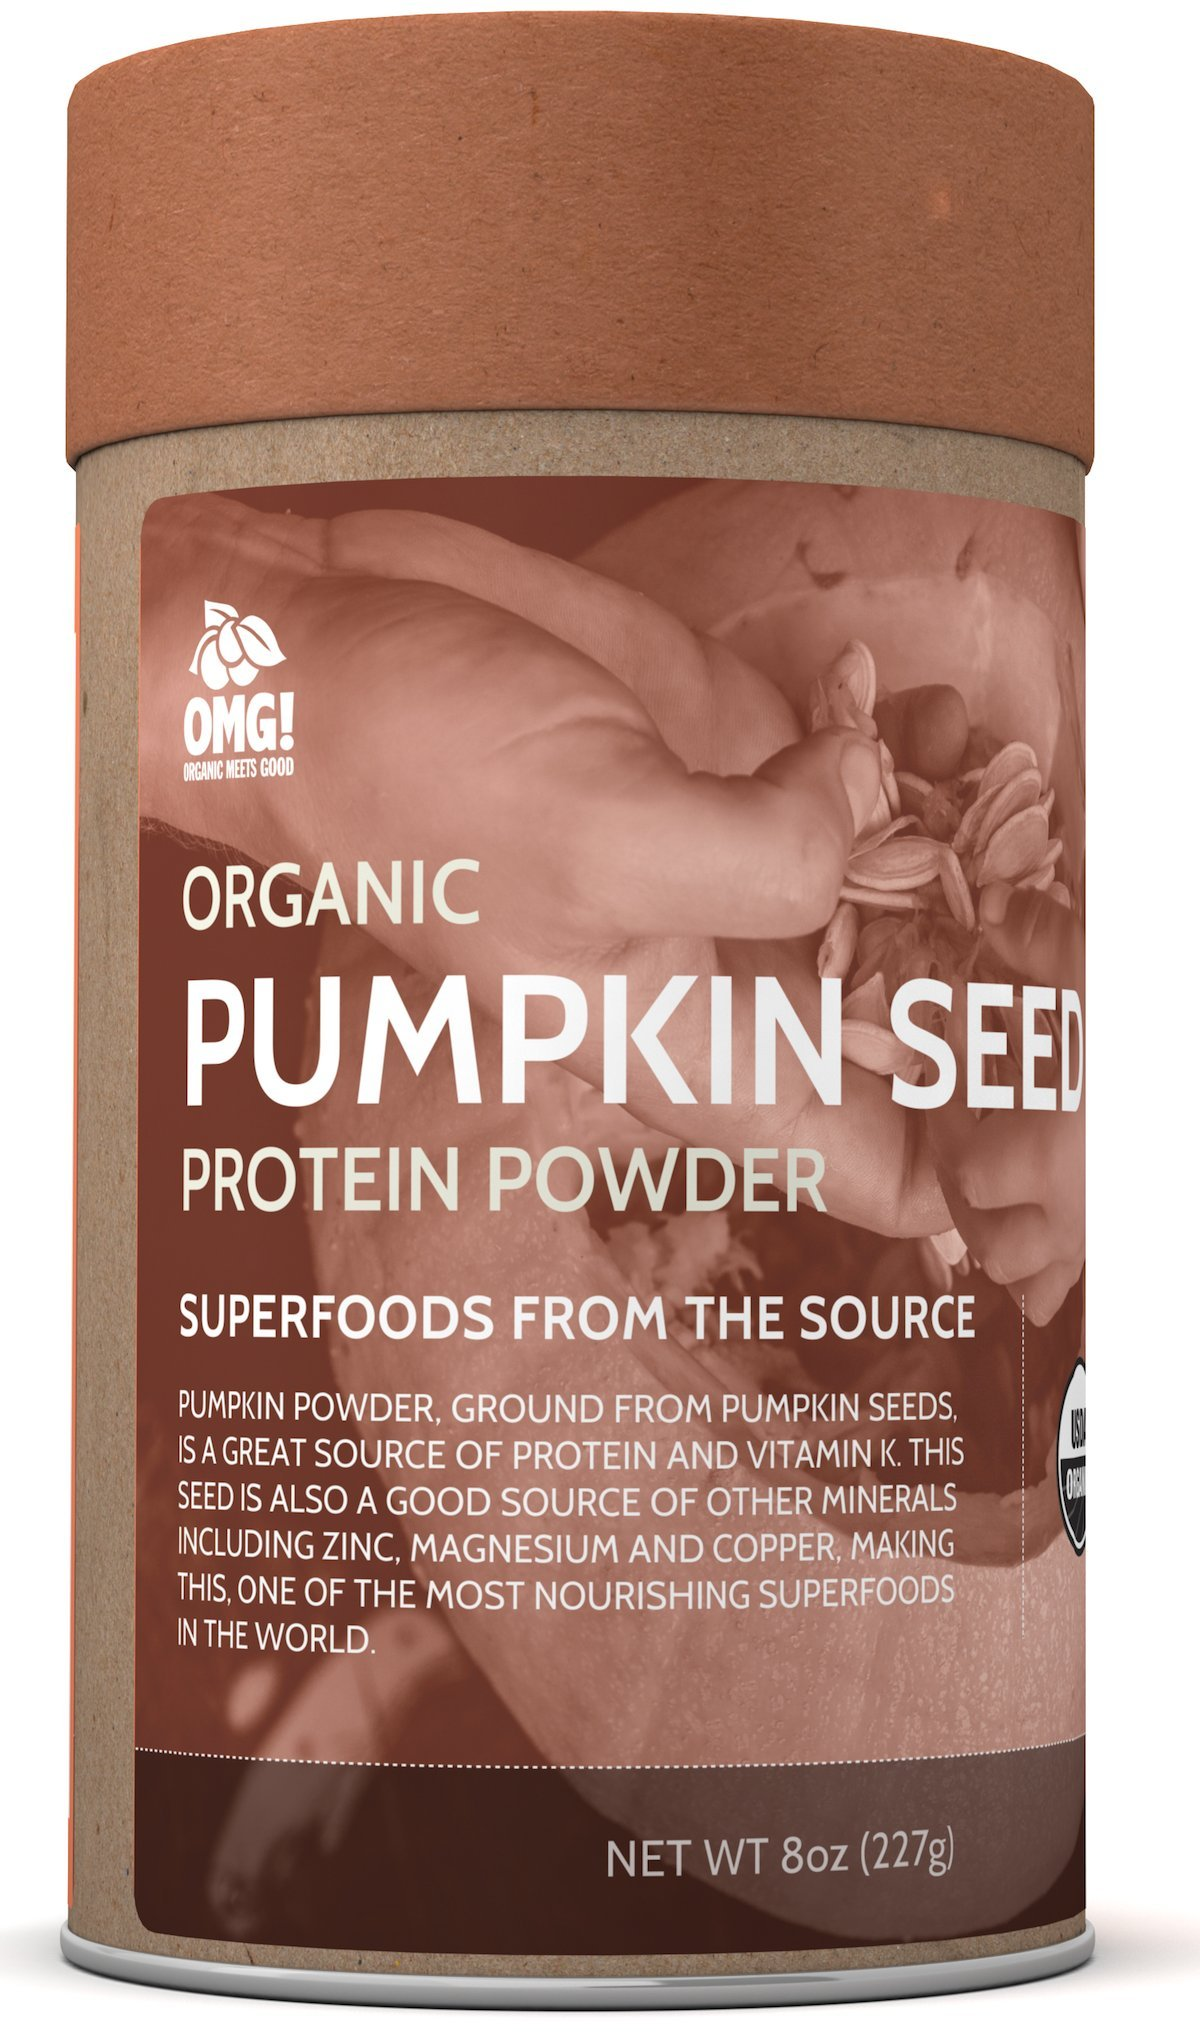 OMG! Superfoods Organic Pumpkin Seed Powder - 100% Pure, USDA Certified Organic Pumpkin Seed Powder - 8oz